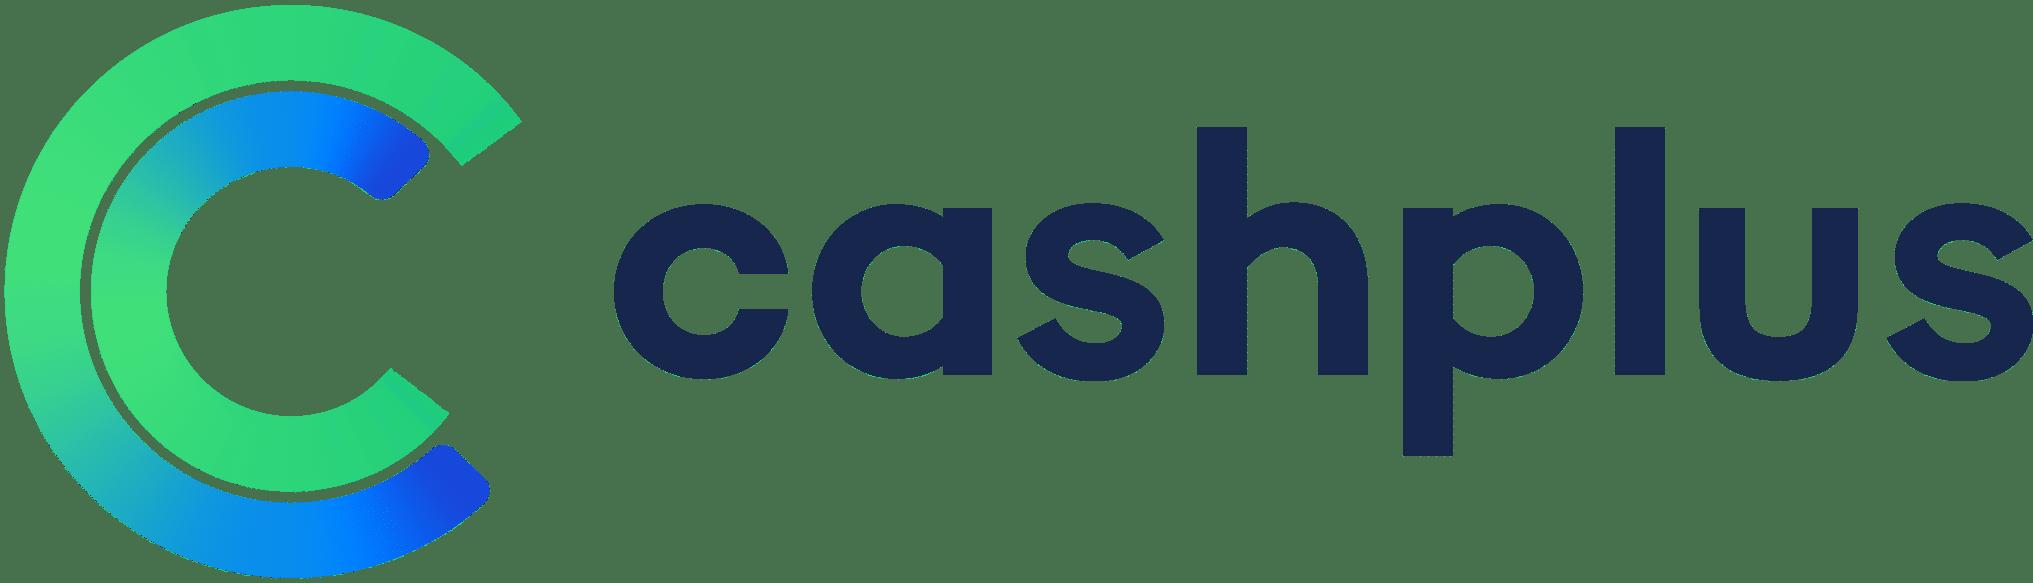 CashPlus - Prepaid Business Expense Card - KashFlow